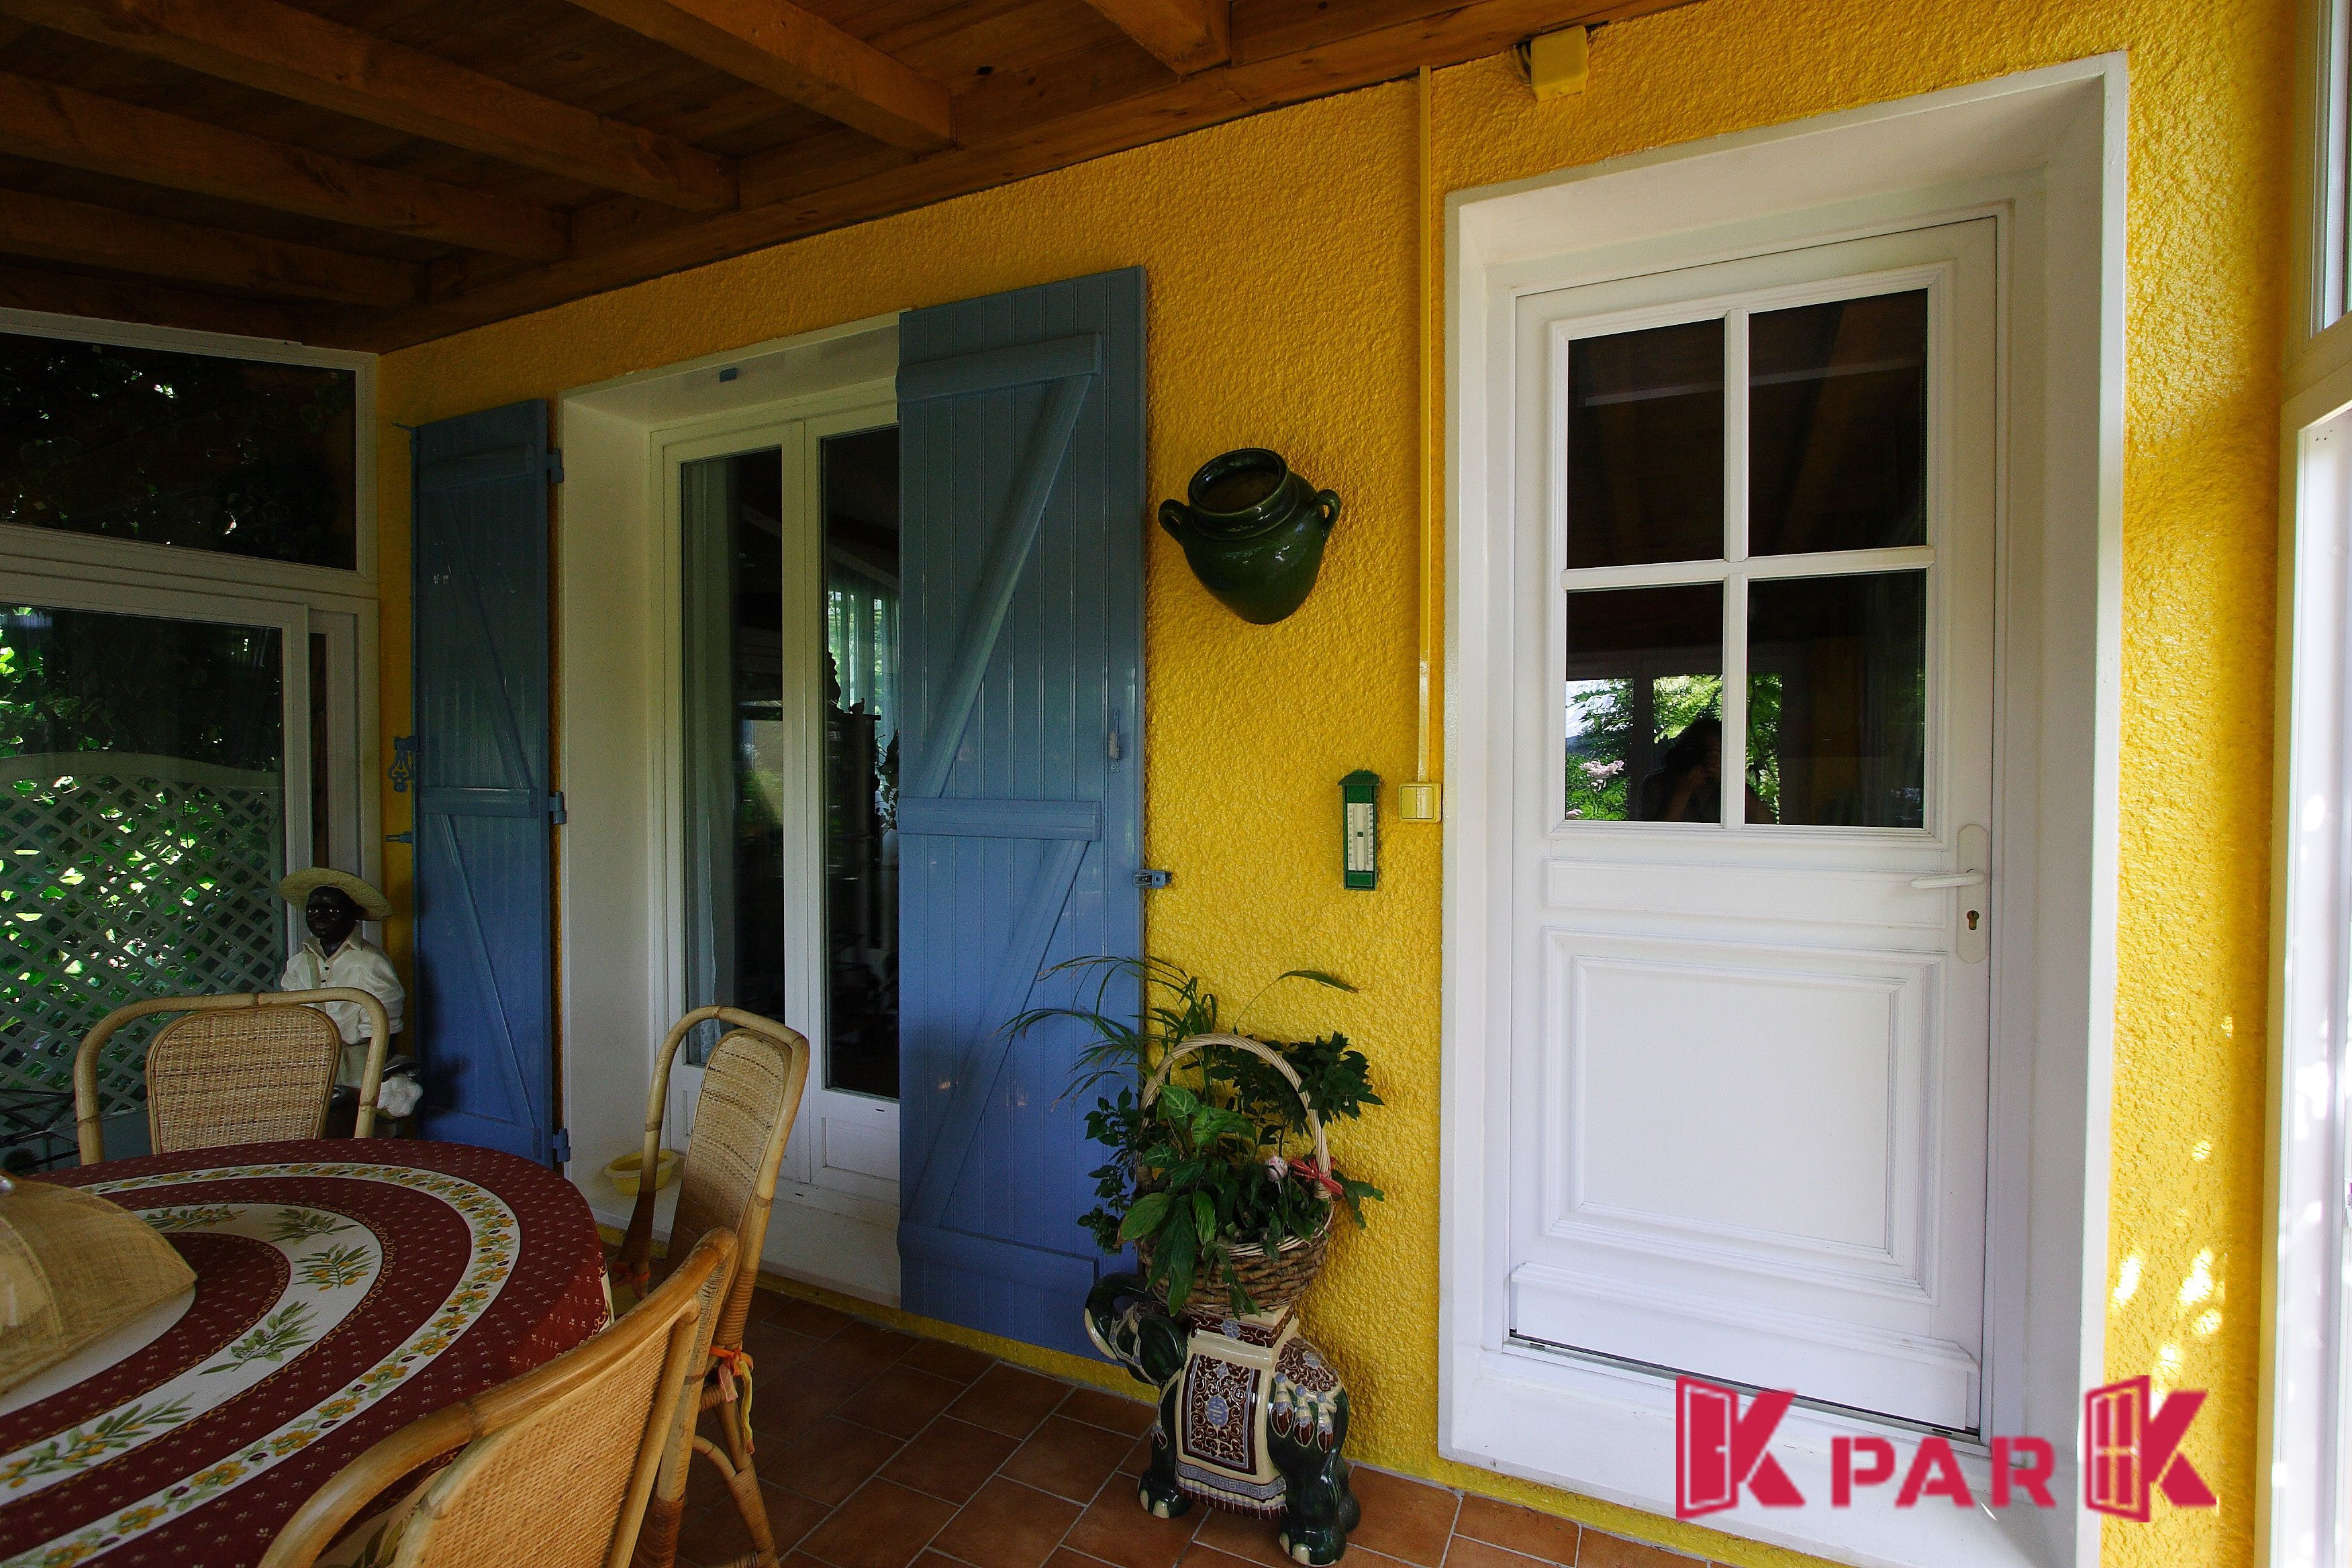 Porte d 39 entr e pvc blanche mod le renoir portes d 39 entr e pvc pinterest entr e portes et pvc - Porte pvc blanche ...